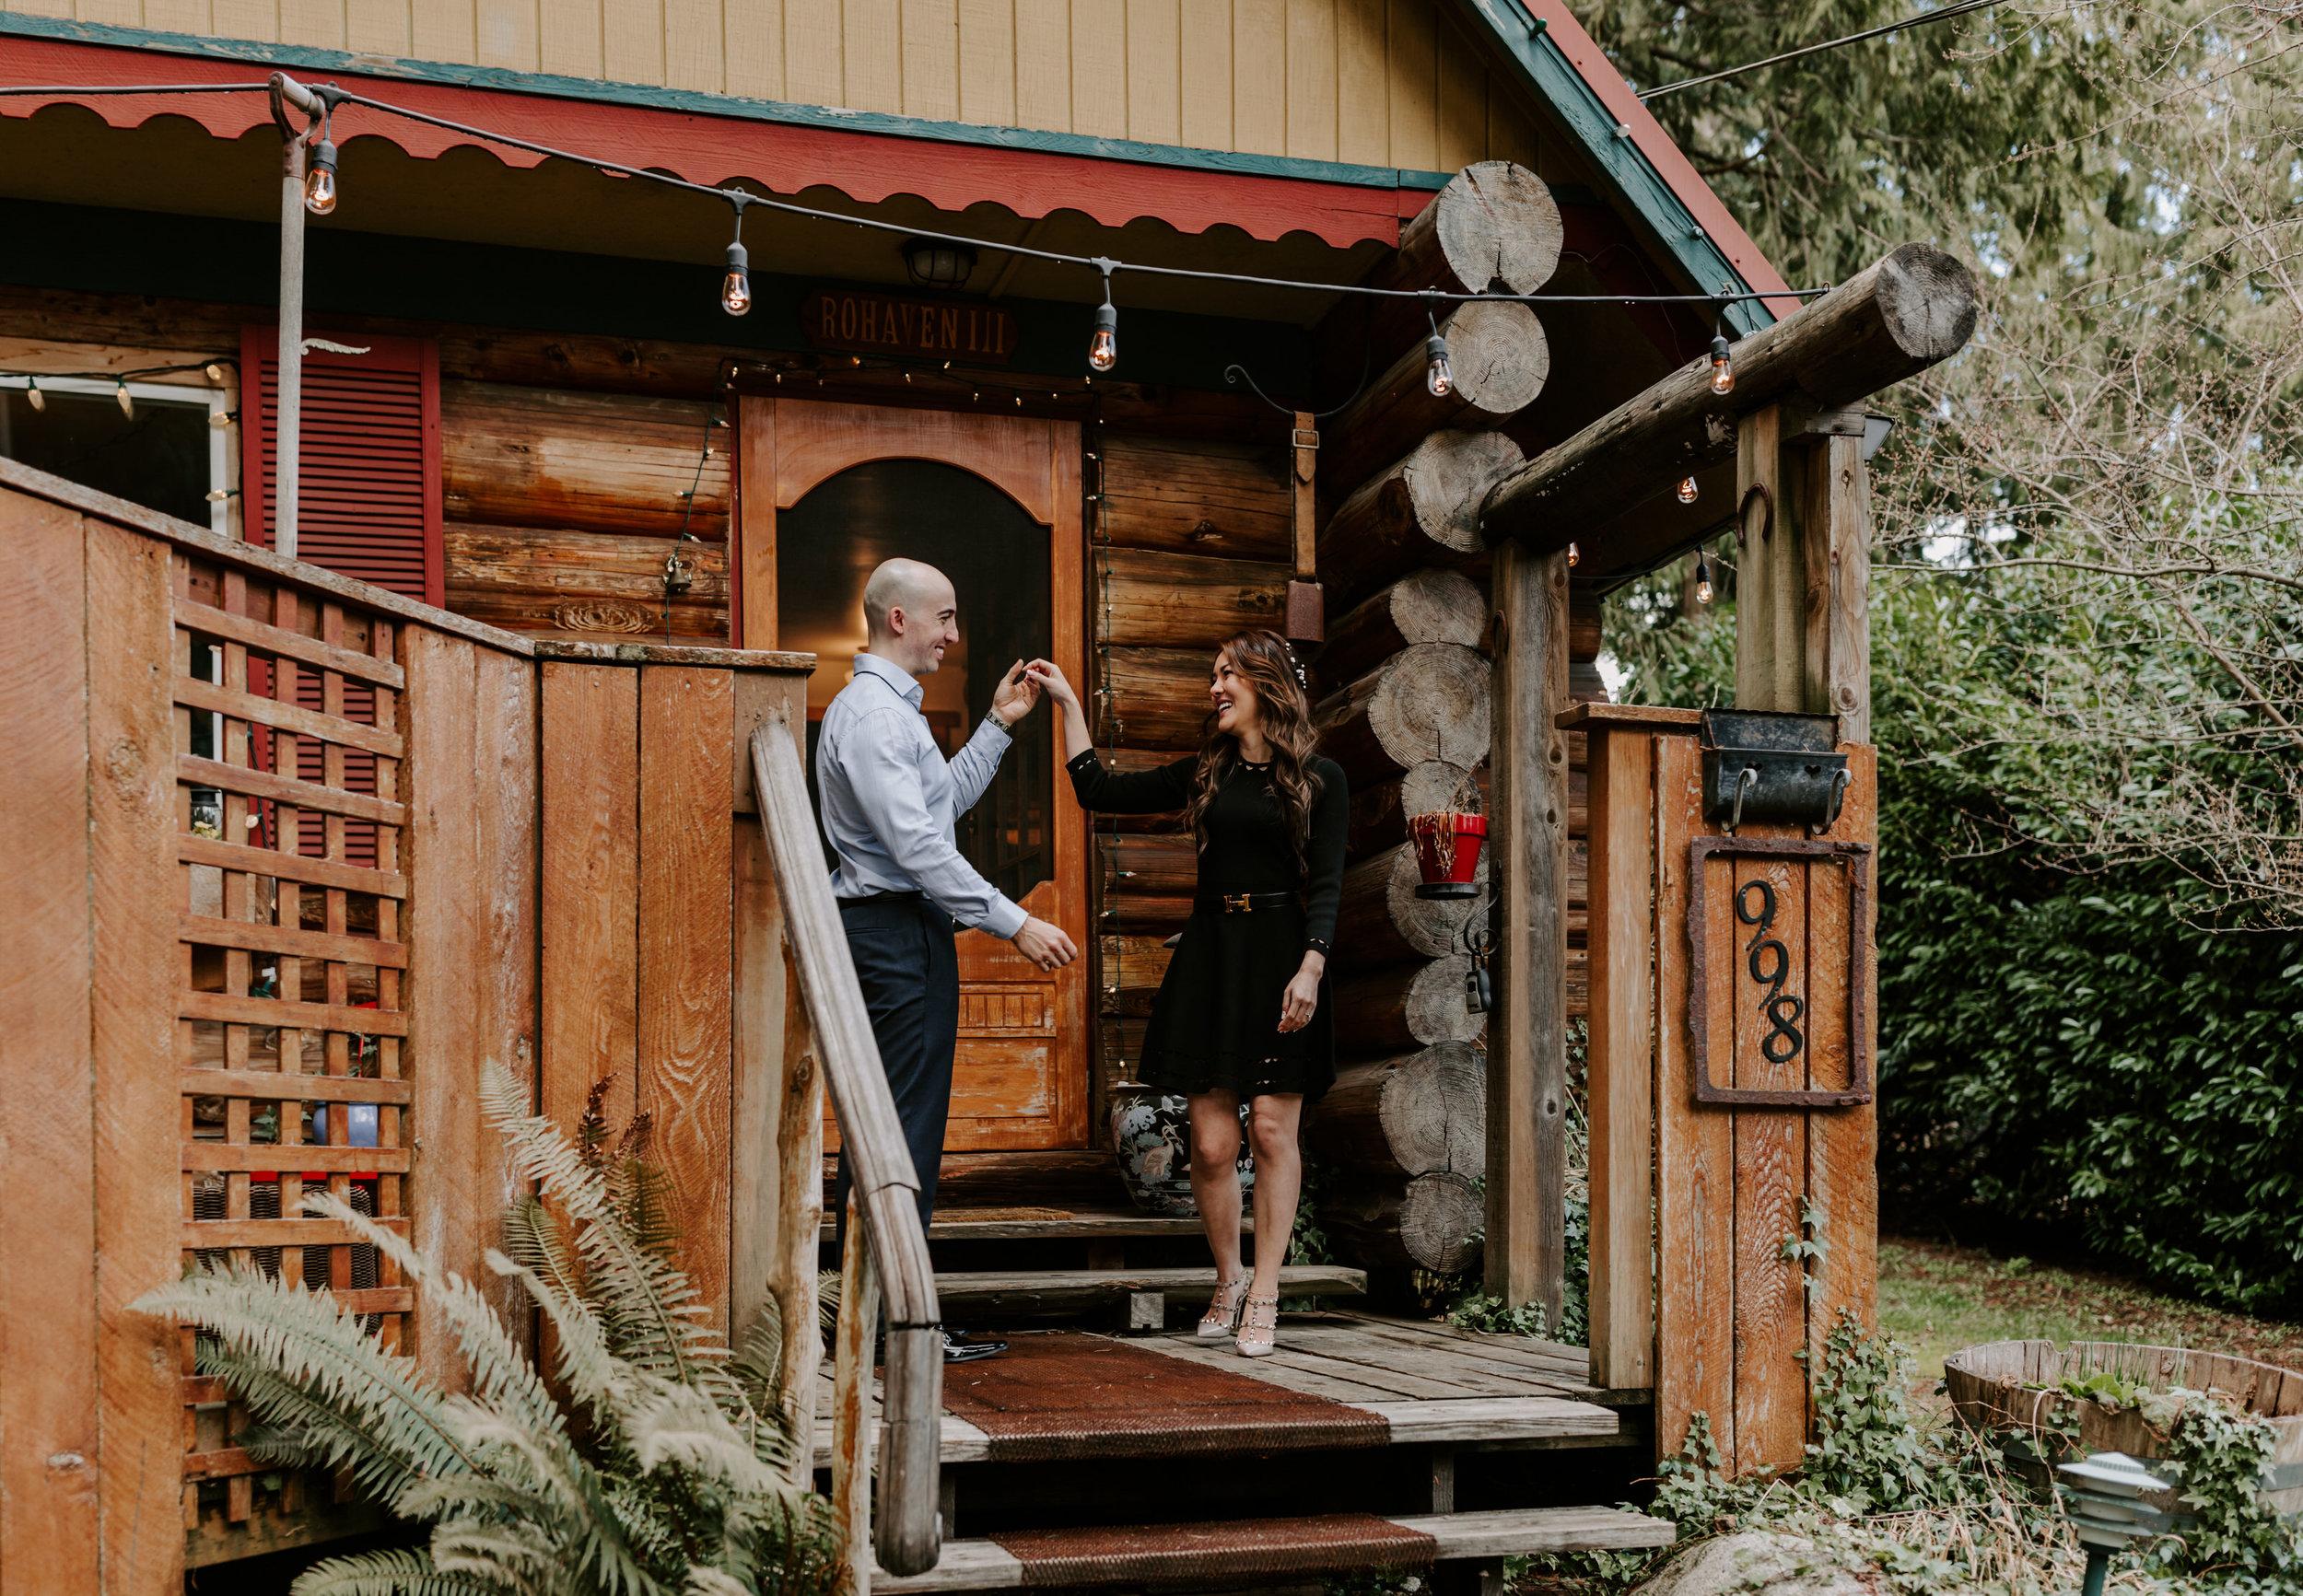 Sunshine Coast Elopement Photos - Forest Wedding - Beach Wedding - Sunshine Coast Wedding Photographer - Vancouver Wedding Photographer - Vancouver Wedding Videographer - 972.JPG